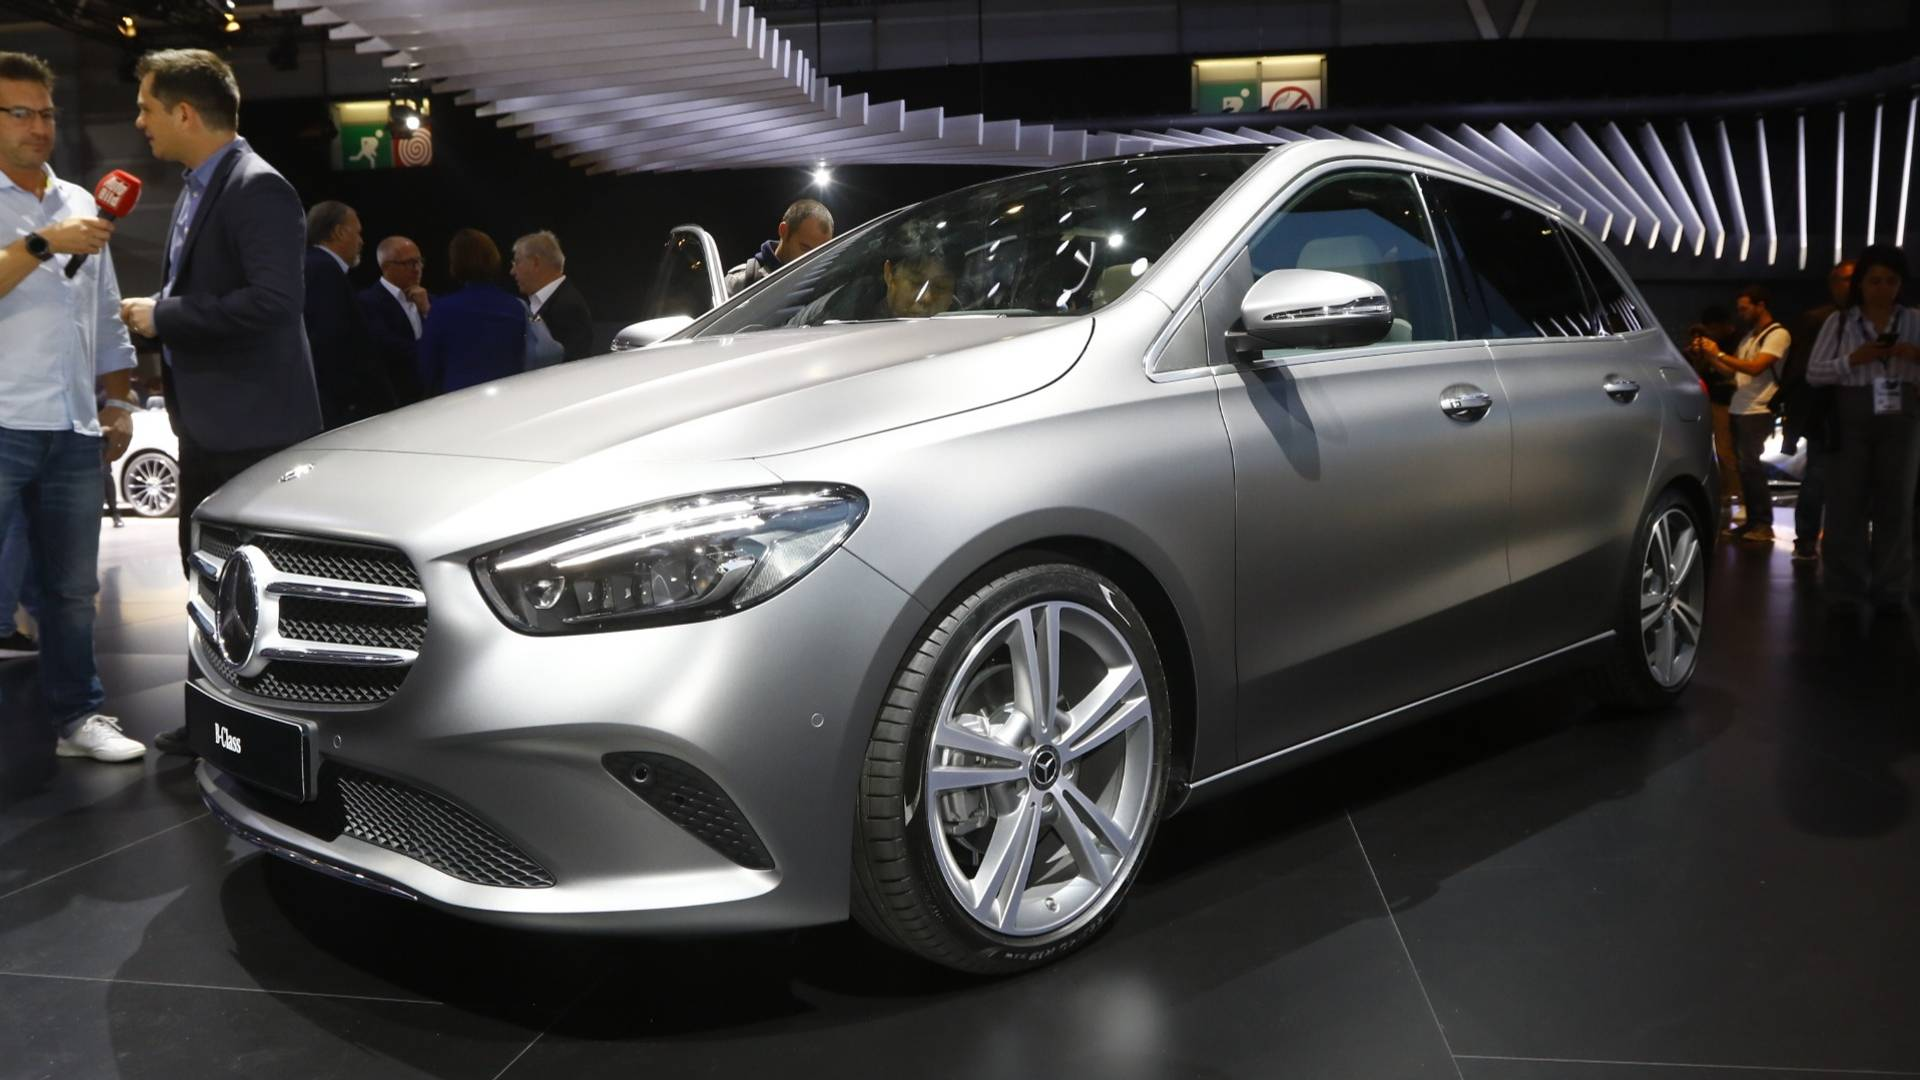 MercedesBenz BClass Brings SemiAutonomous Tech To Paris - Mercedes car show